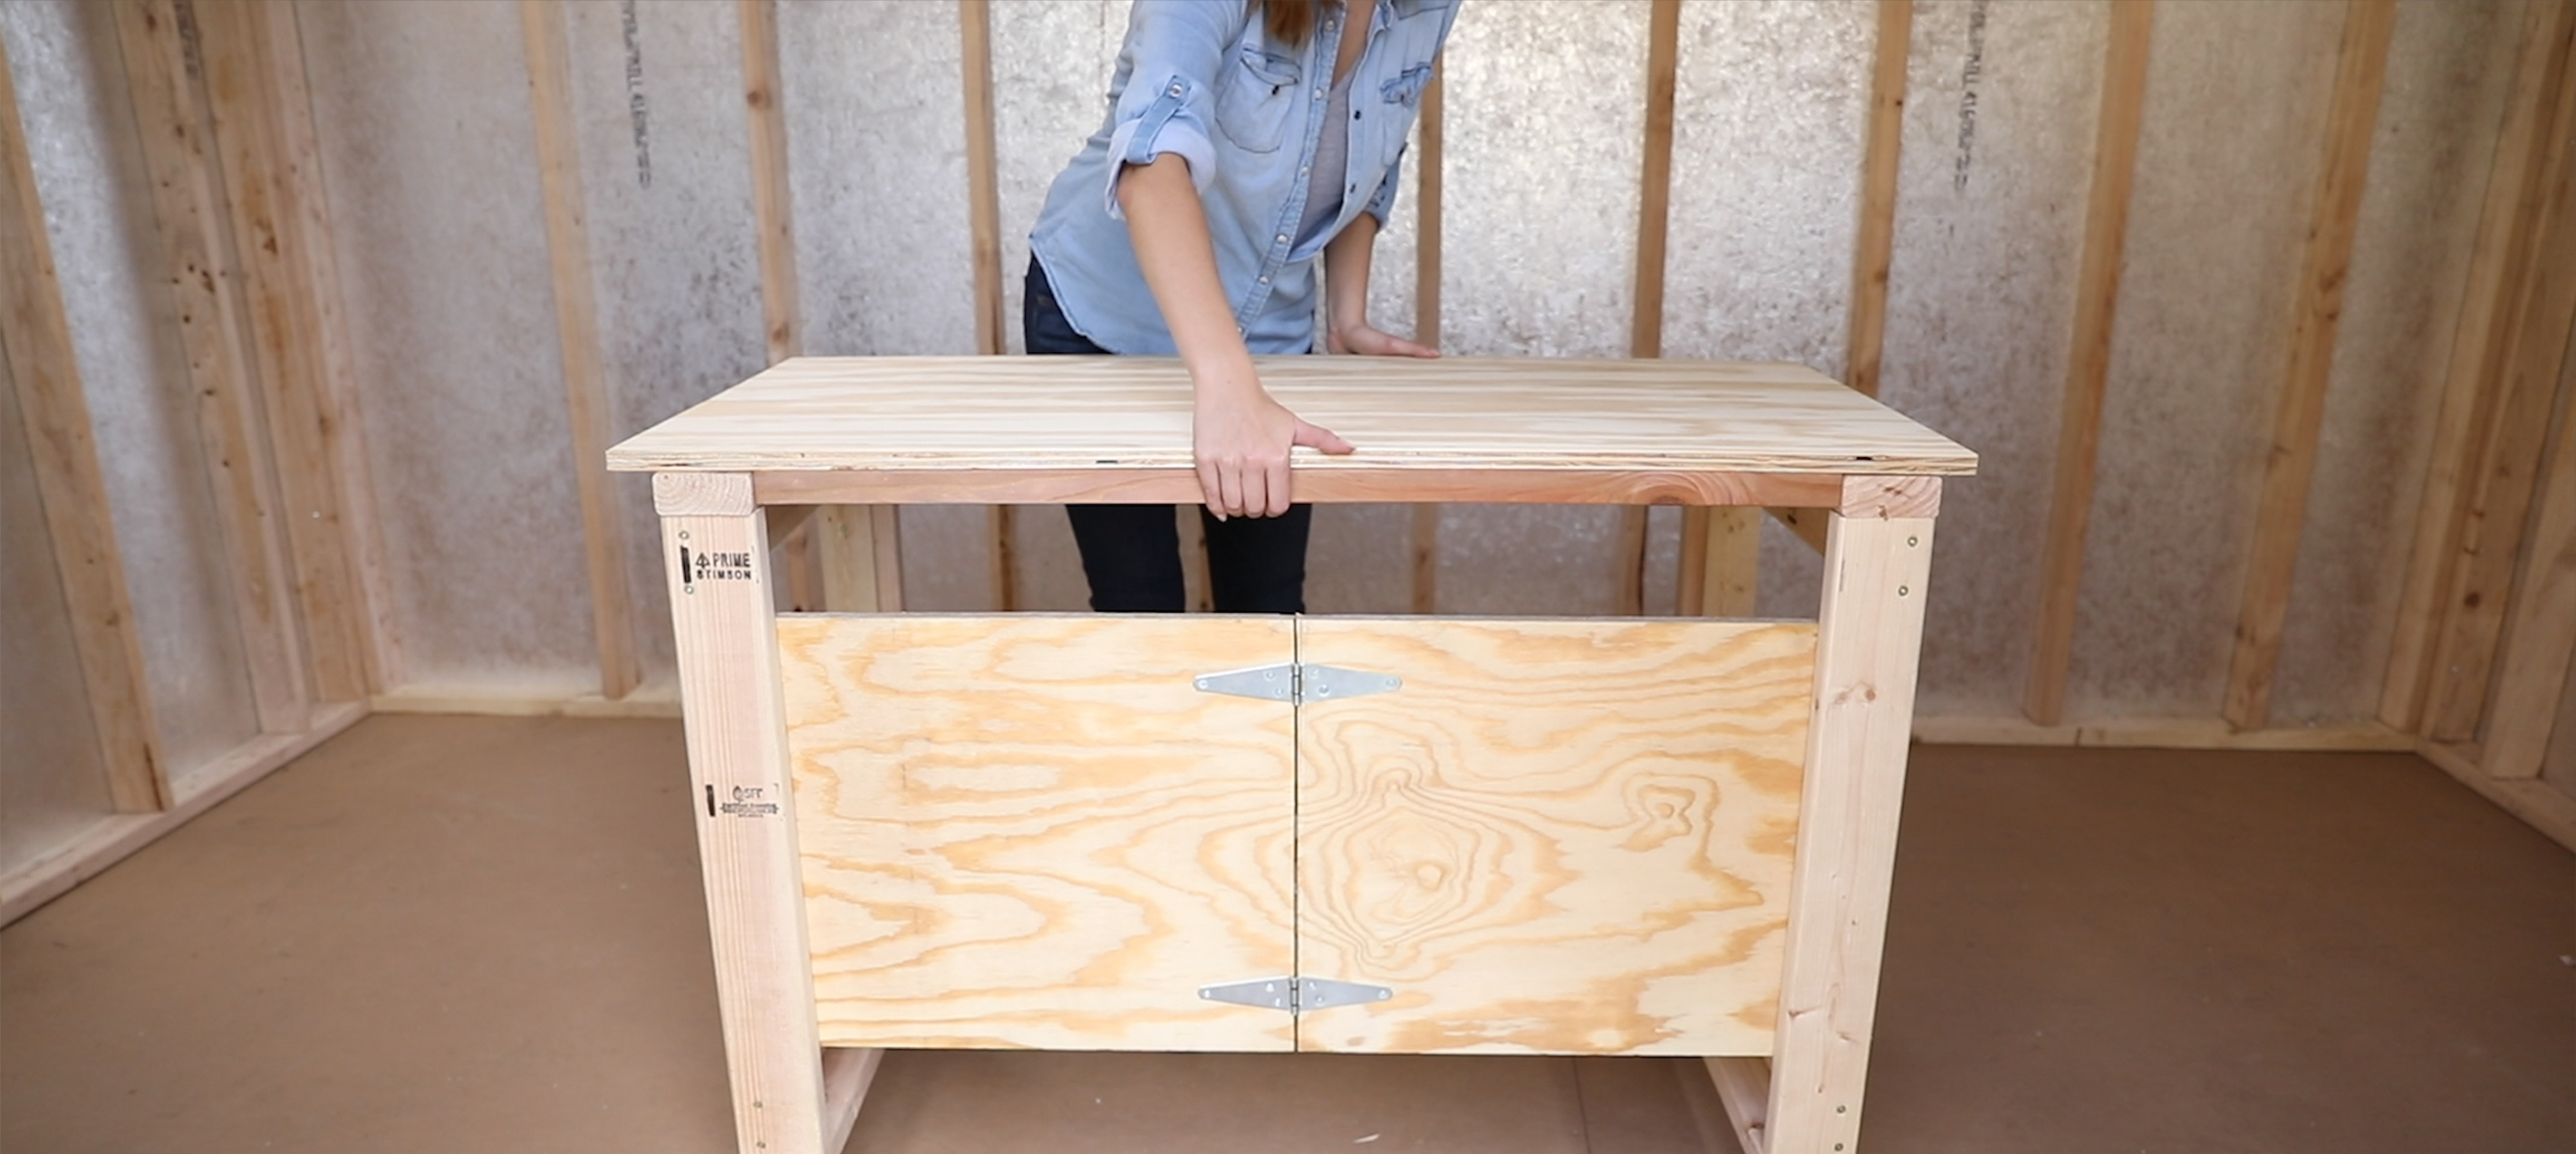 Diy Workshop Foldable Workbench Tuff Shed